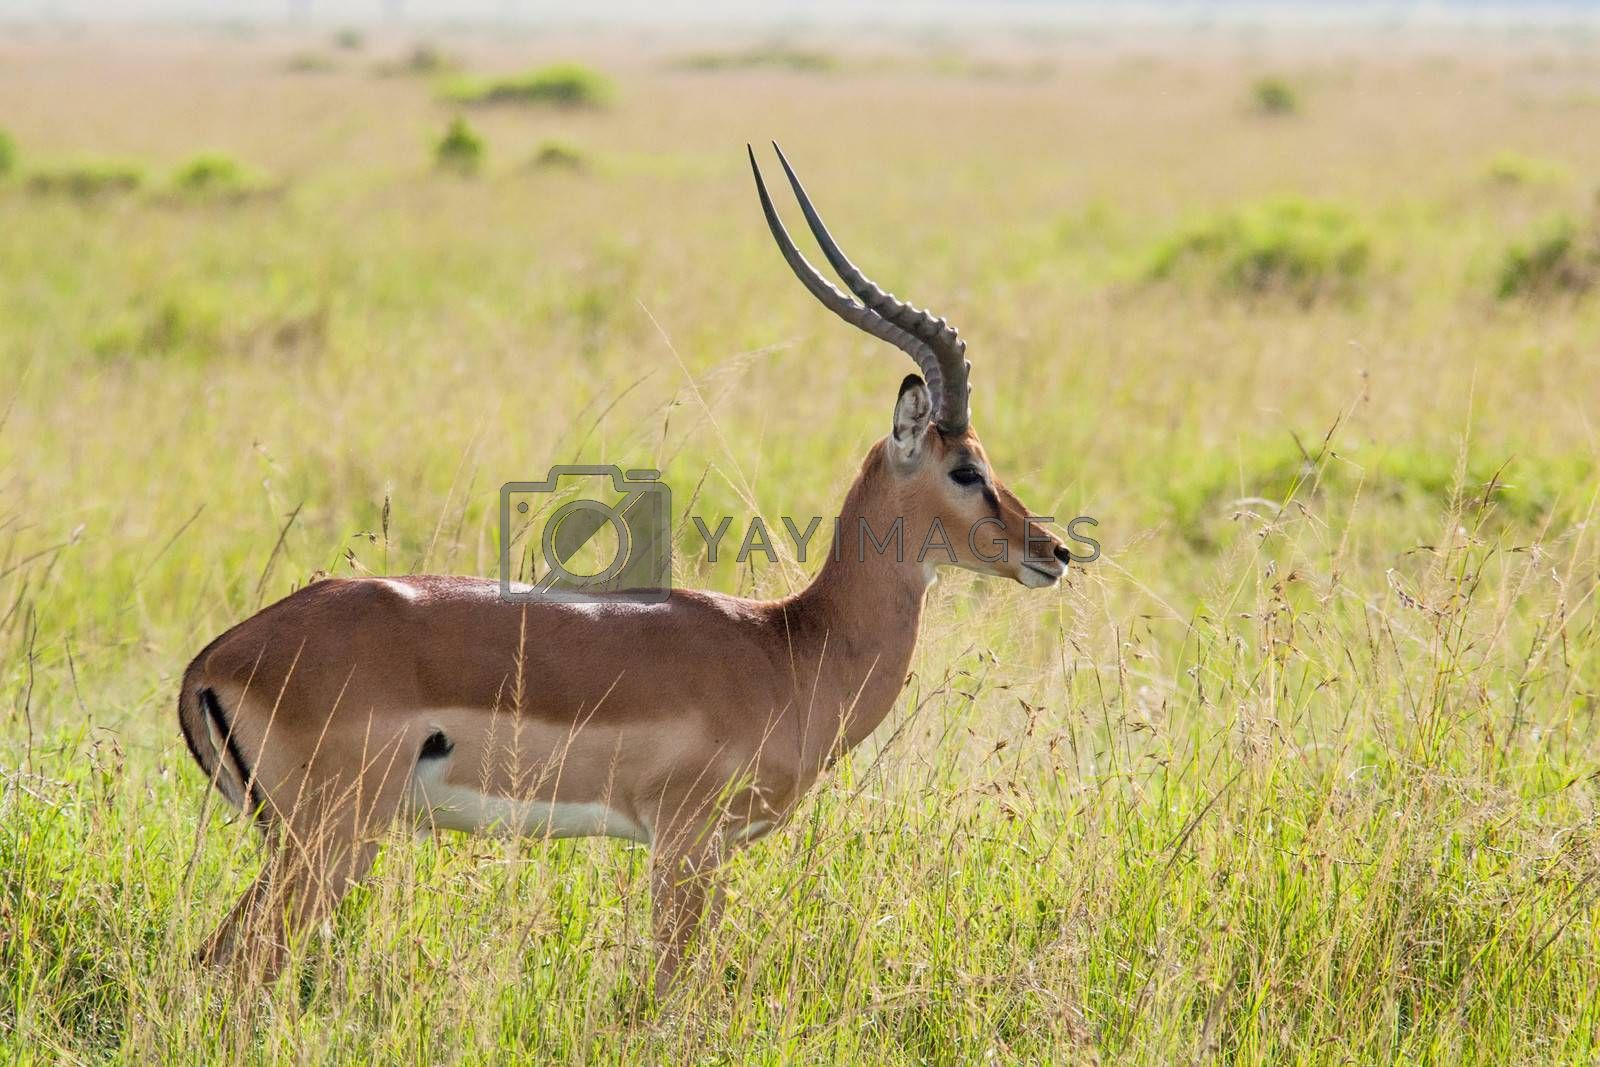 Photo of an Impala in the Massai Mara Savannah, Kenya. Scientific name: Aepyceros melampus